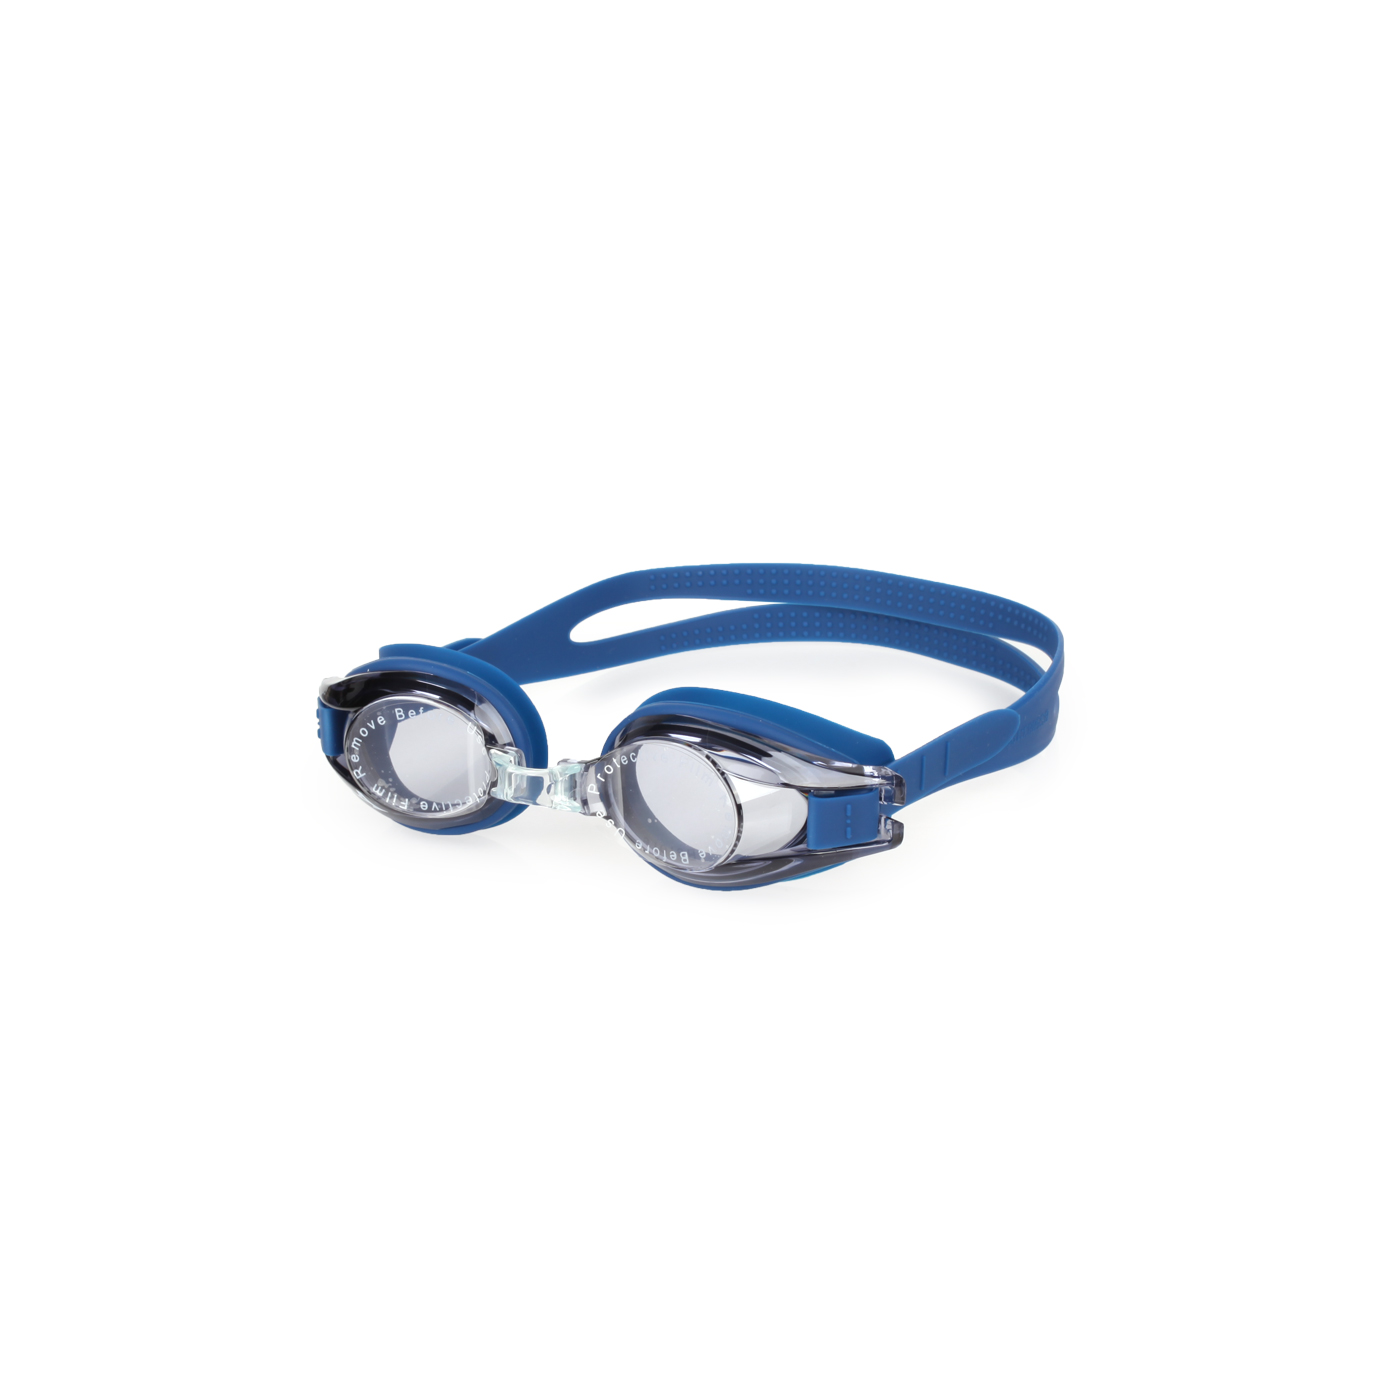 MIZUNO 兒童泳鏡  SWIMN3JF600000-09 - 藍